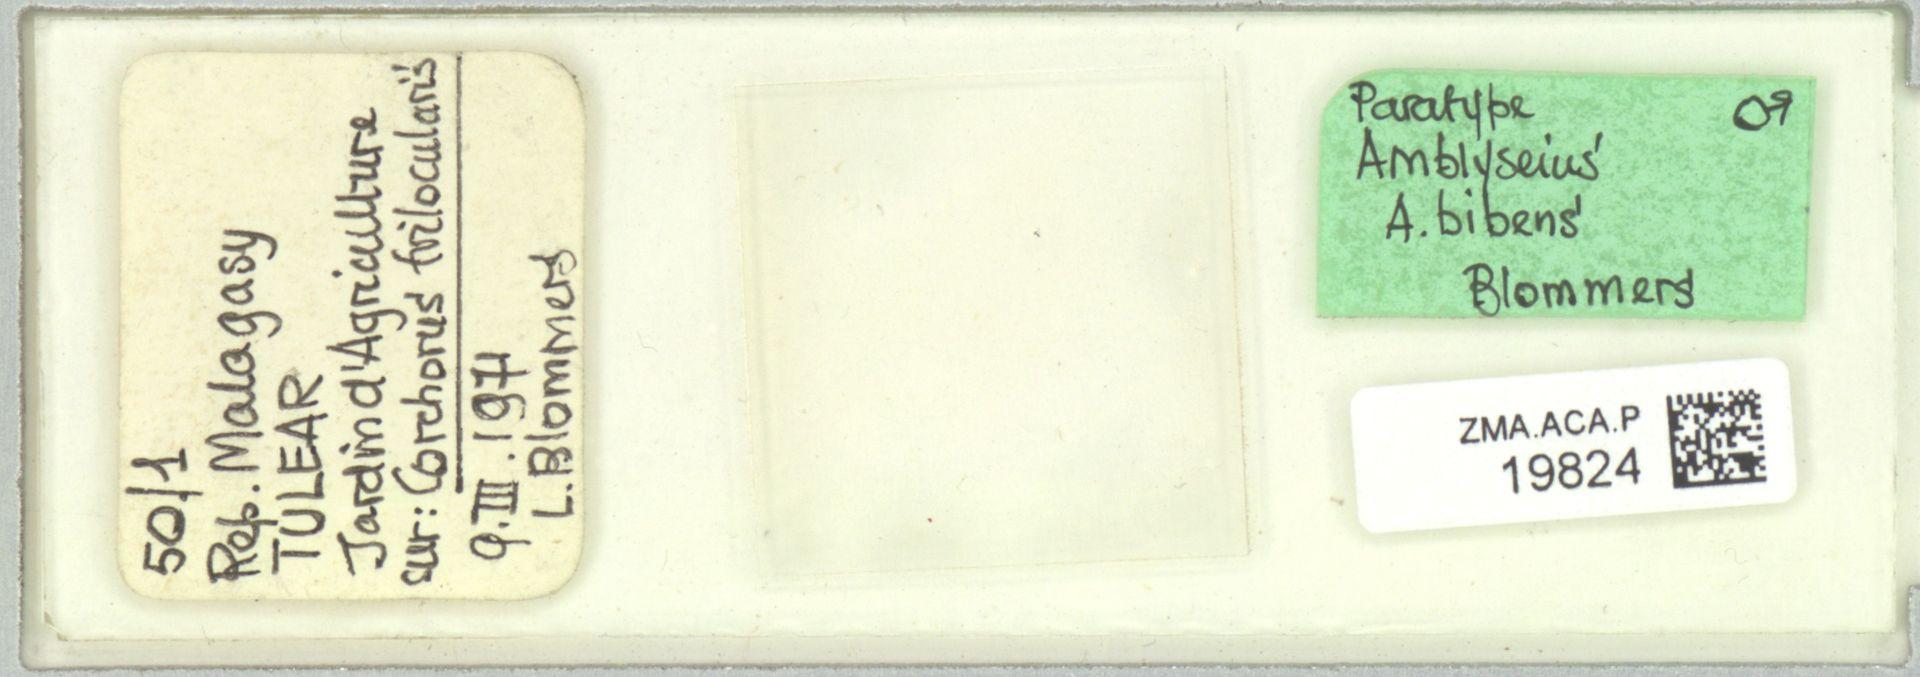 ZMA.ACA.P.19824 | Amblyseius (Amblyseius) bibens Blommers & Chazeau